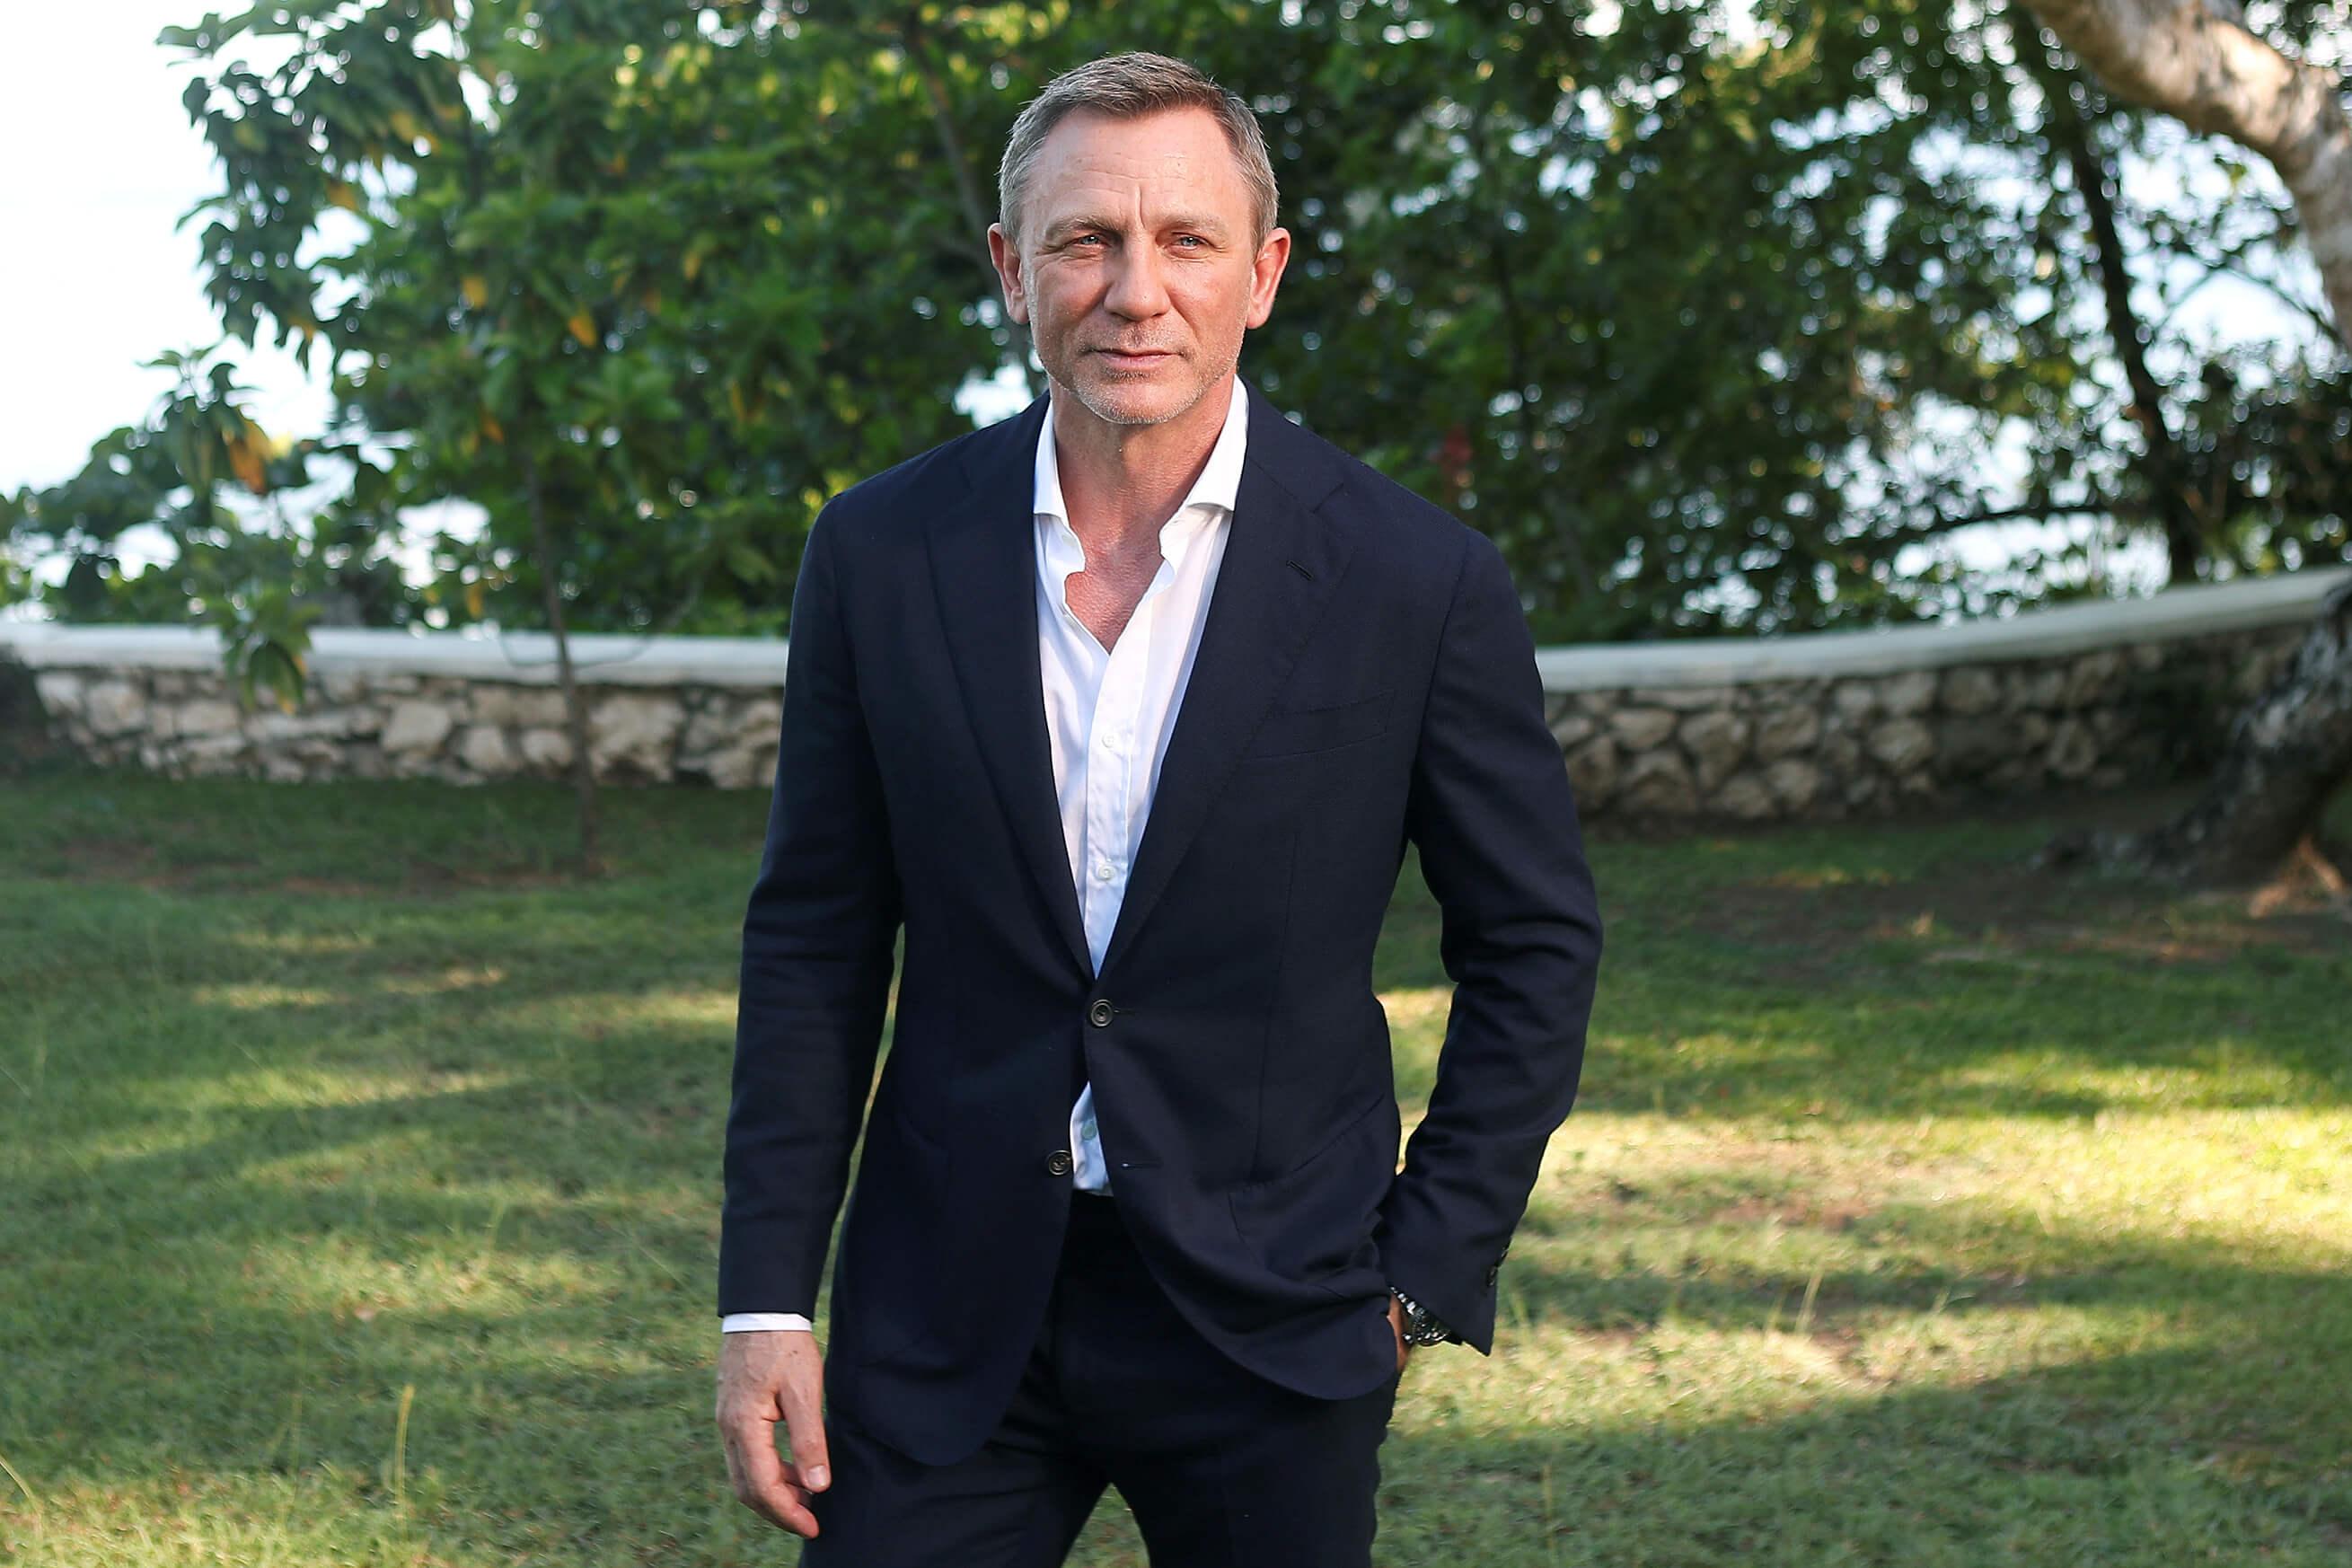 James Bond 25: Αυτό είναι το τρέιλερ της νέας ταινίας!